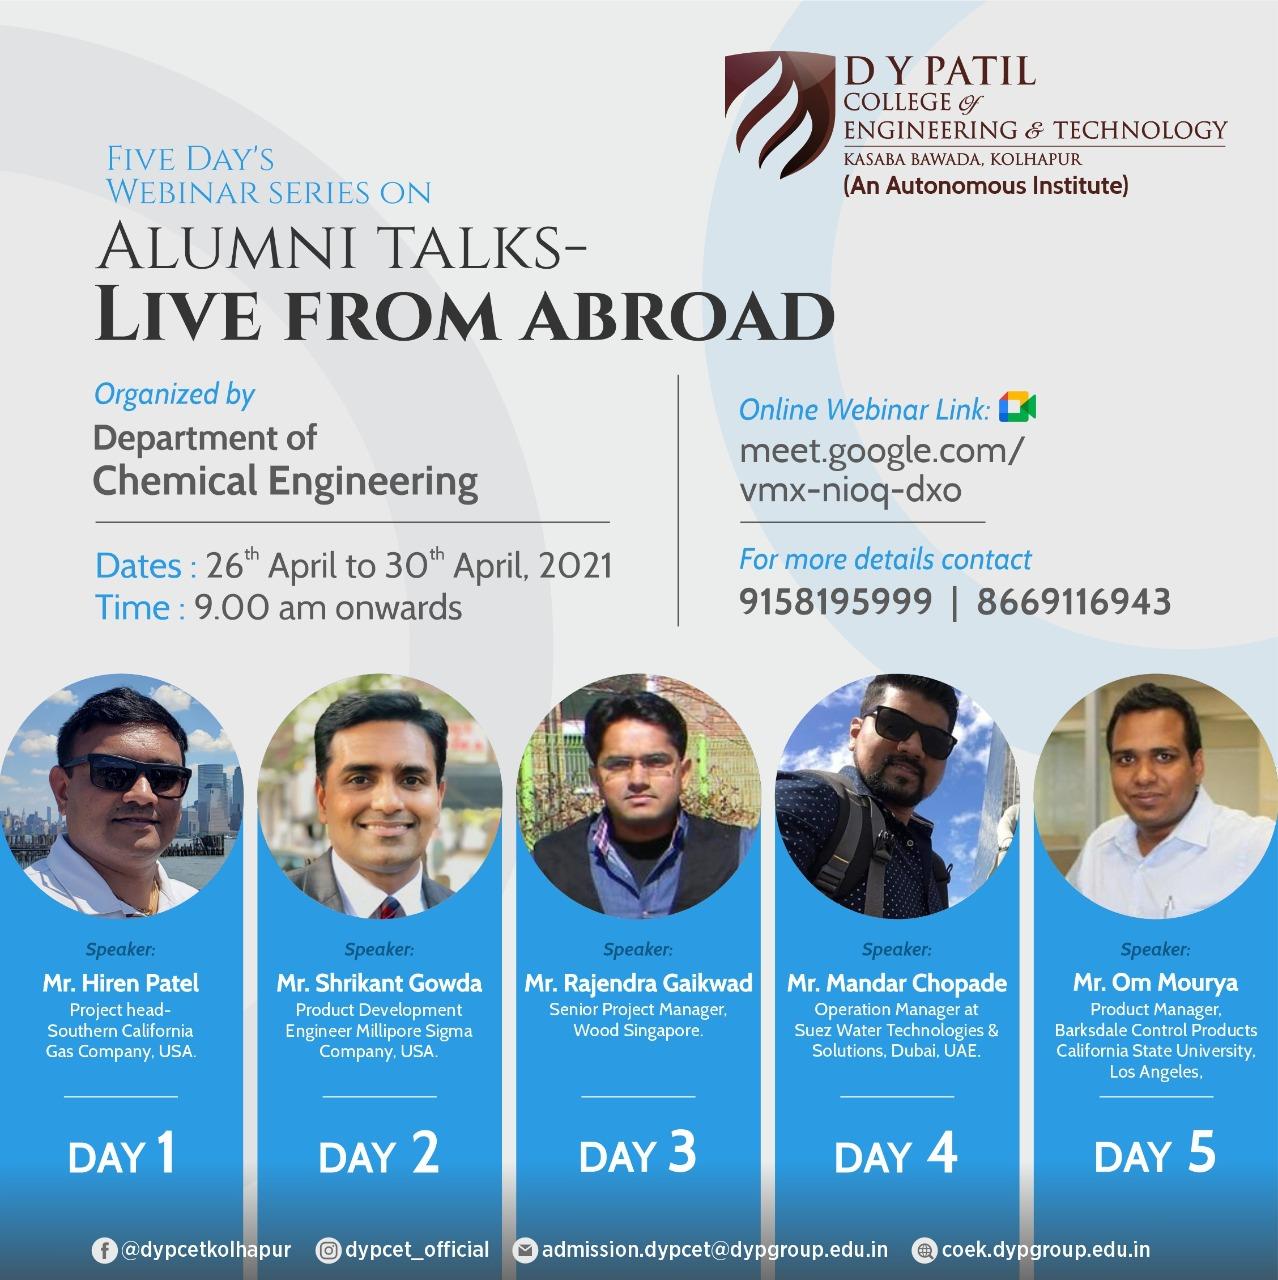 Five day webinar series on Alumni Talks - Live from abroad (1)